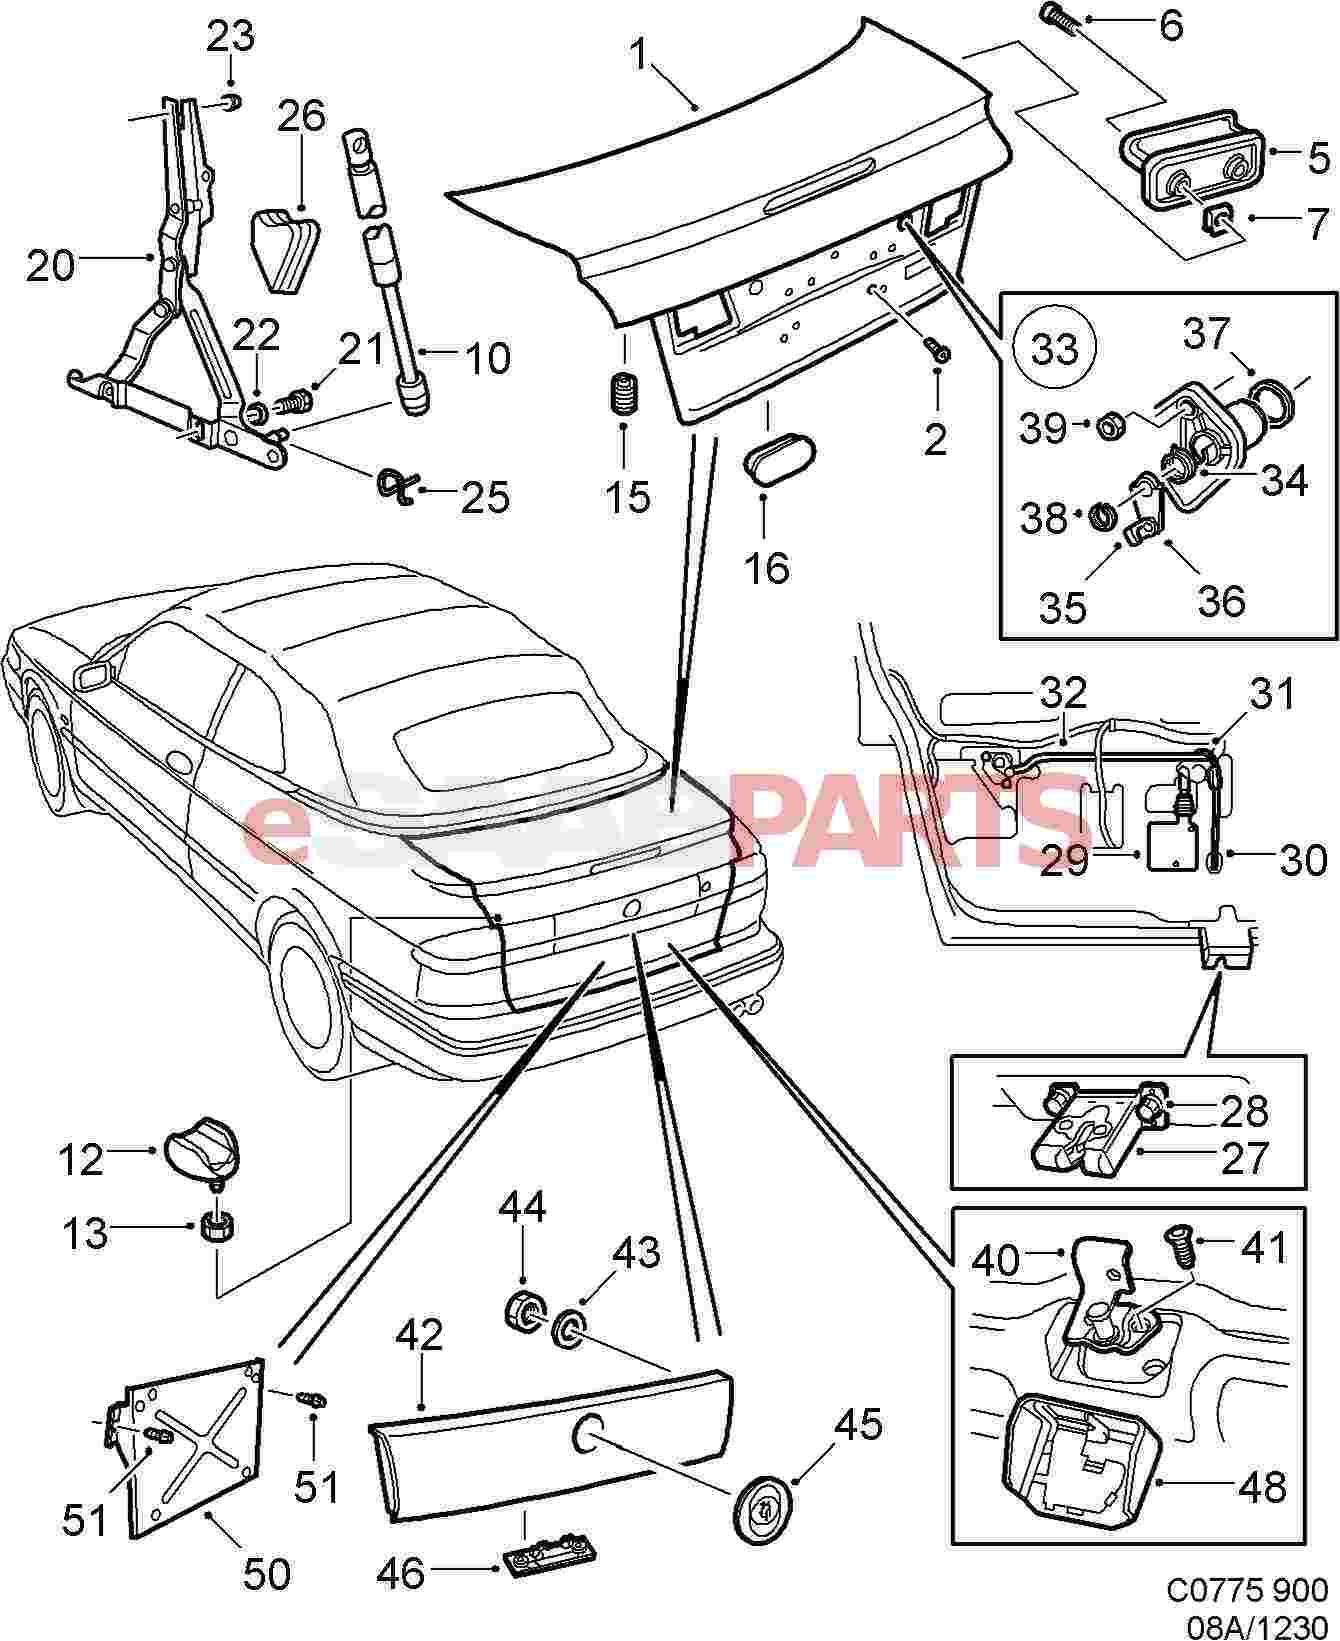 Diagram Of Car Body Wiring Diagram Database